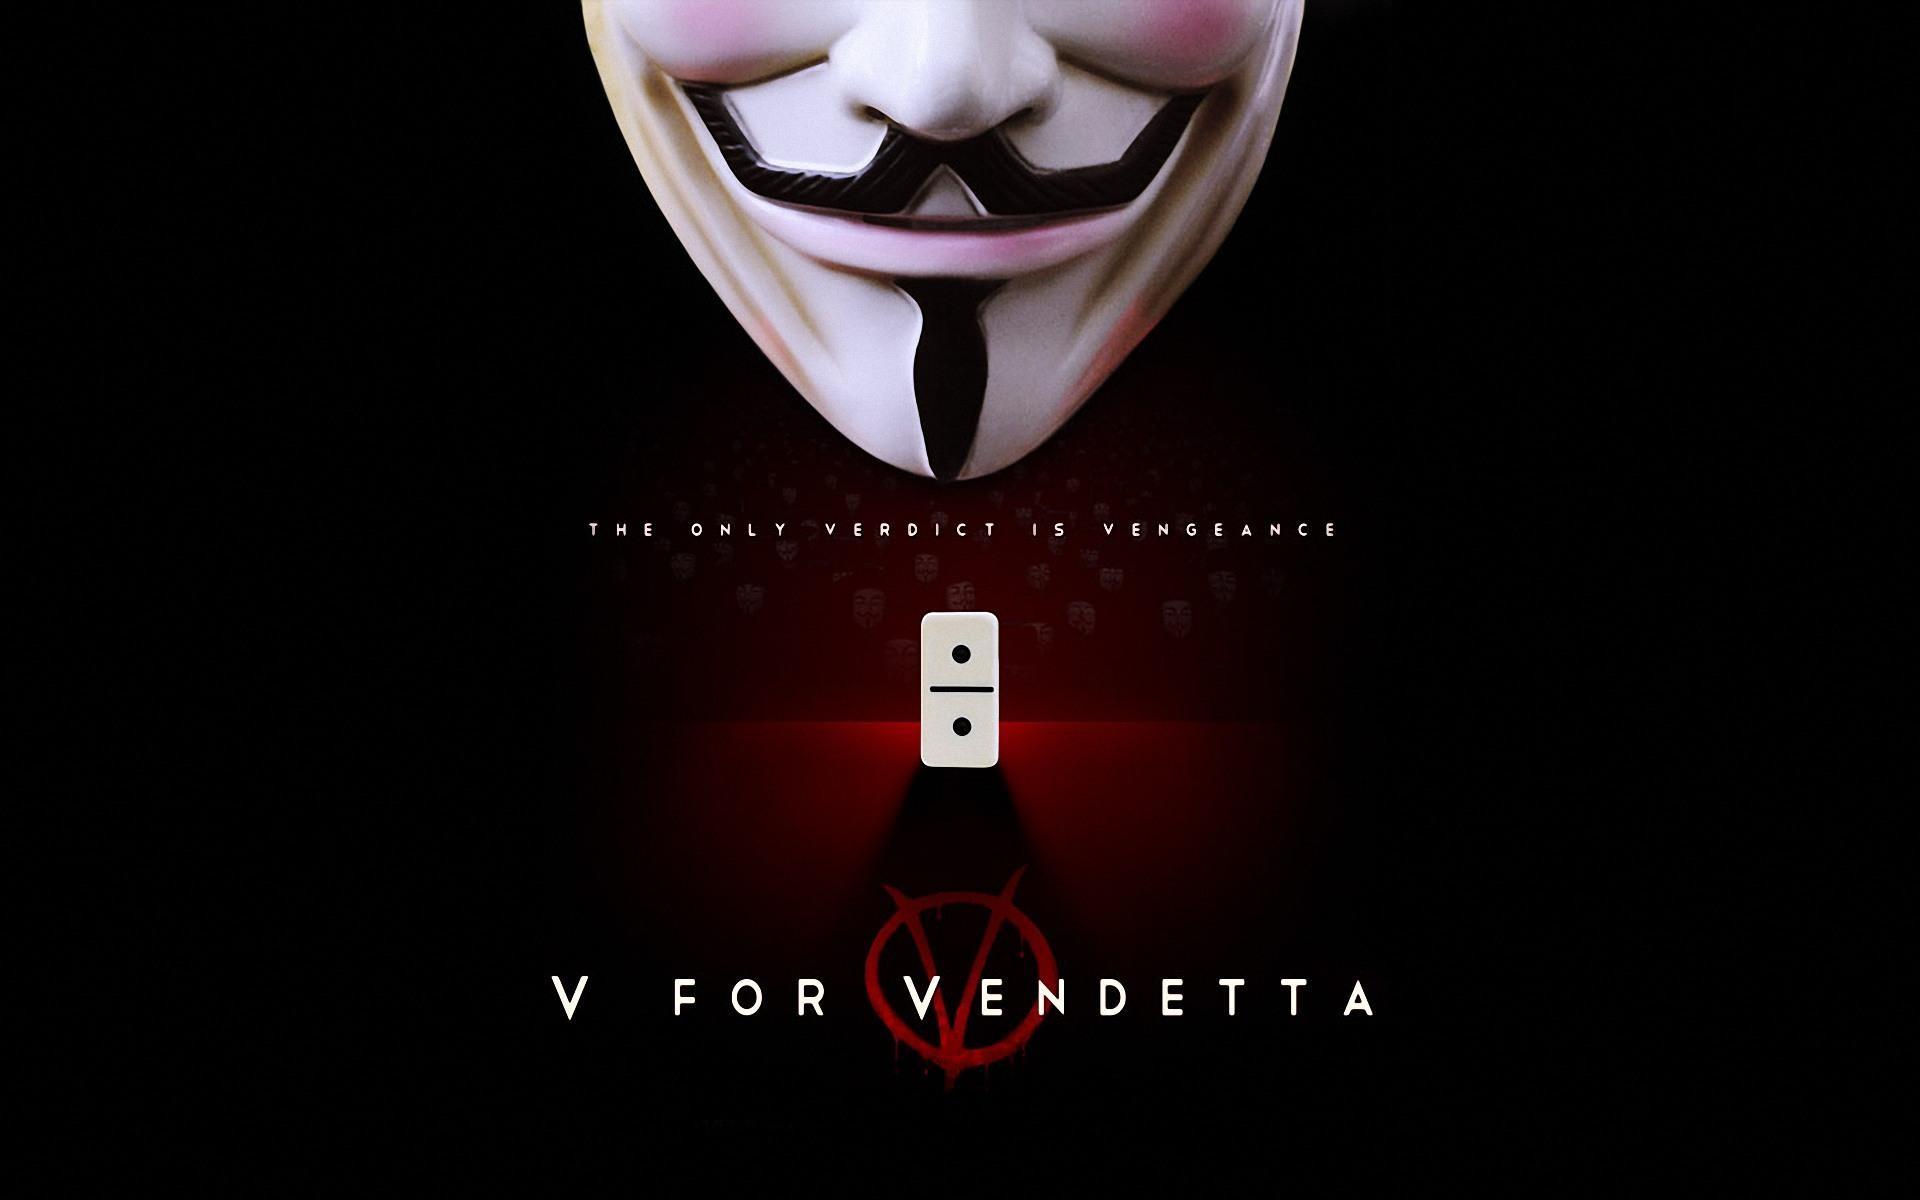 V for Vendetta HD